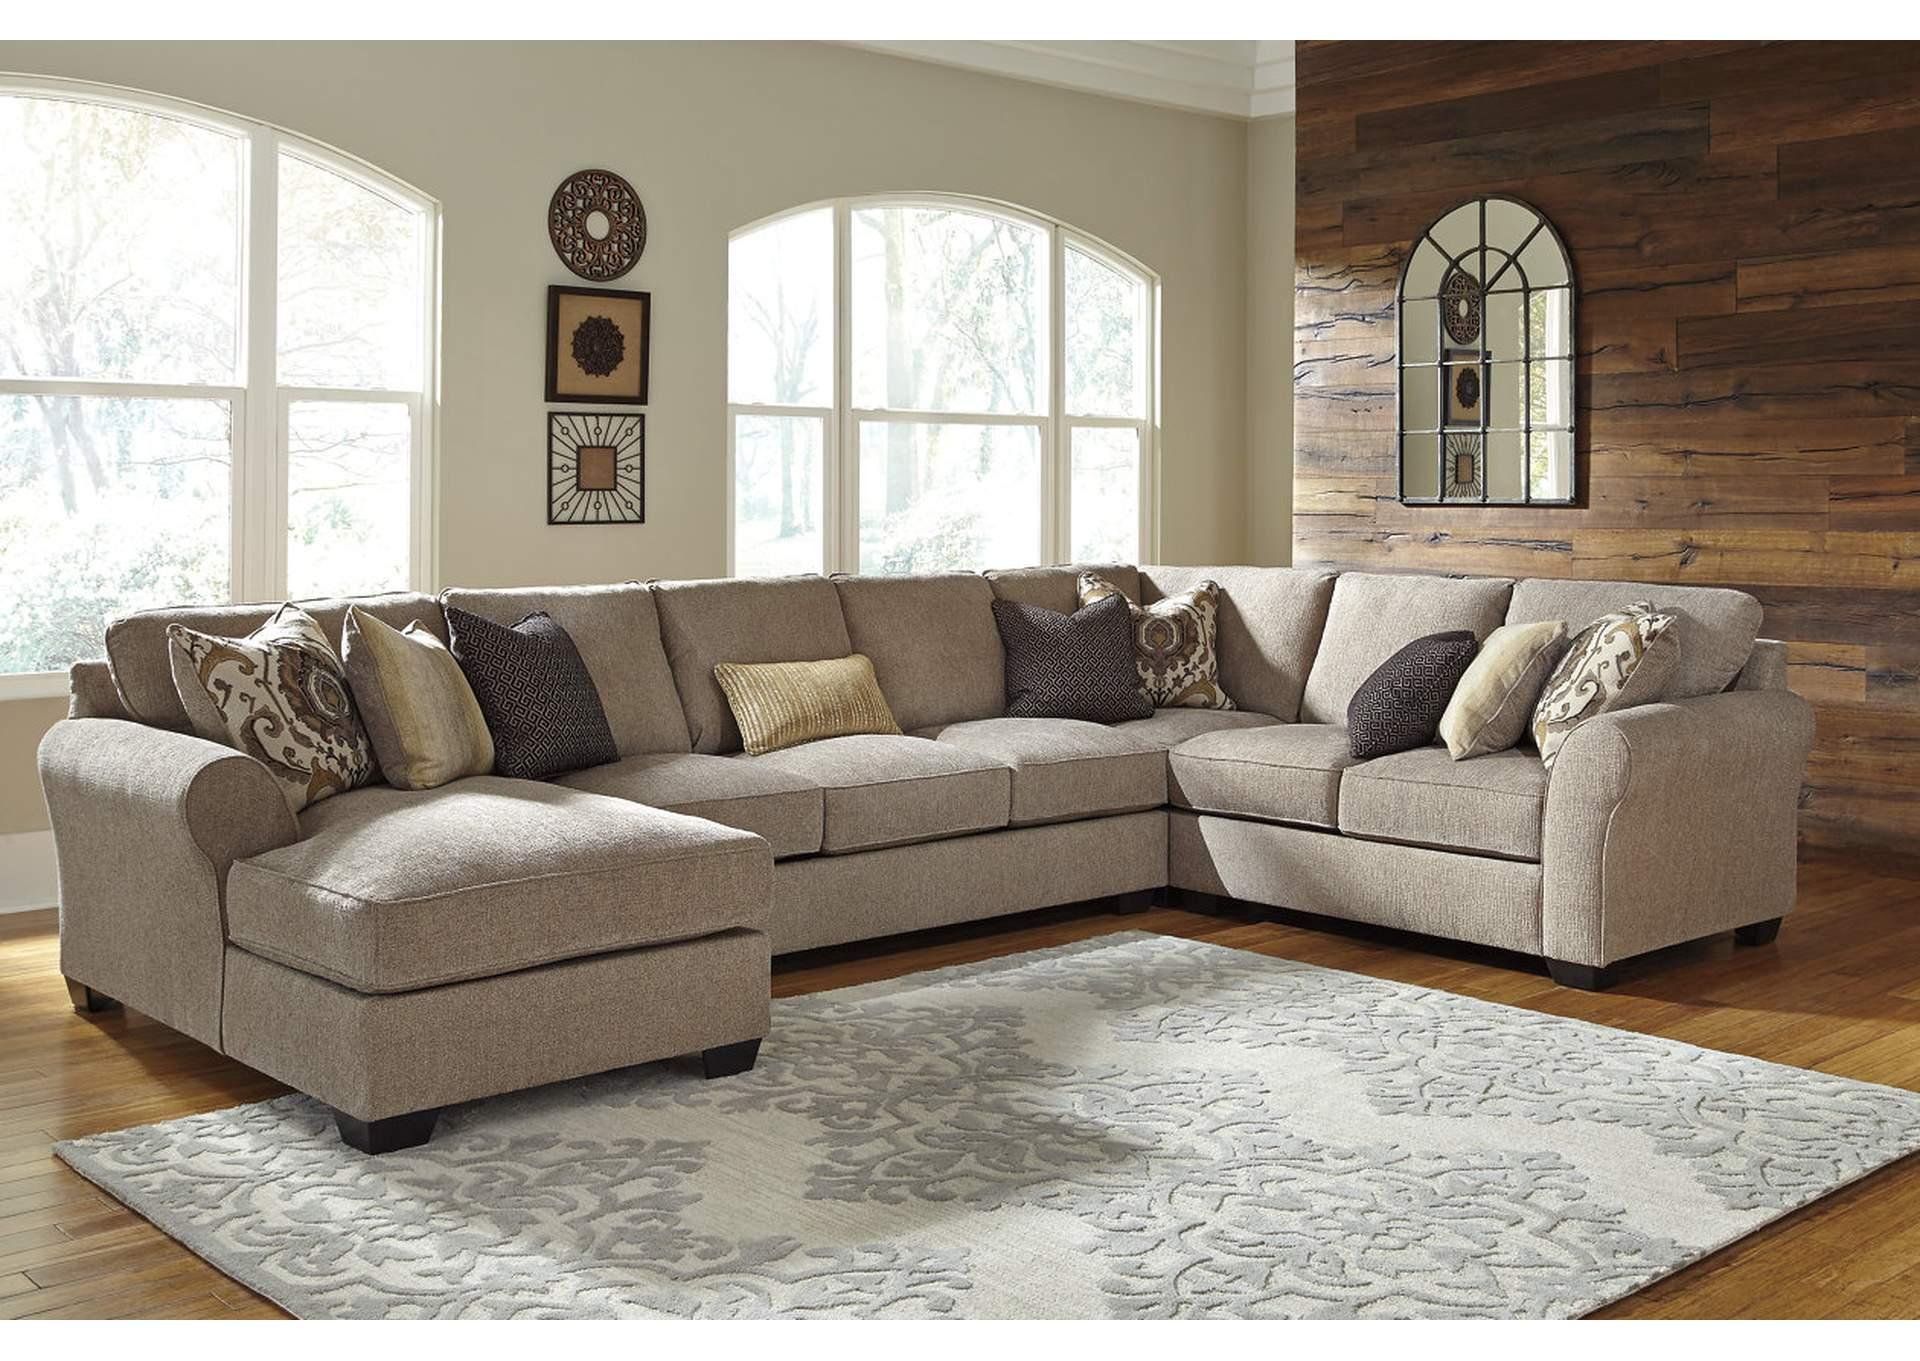 Langlois Furniture. Langlois Furniture   Muskegon, Mi Pantomine Driftwood  Sectional W/left Facing